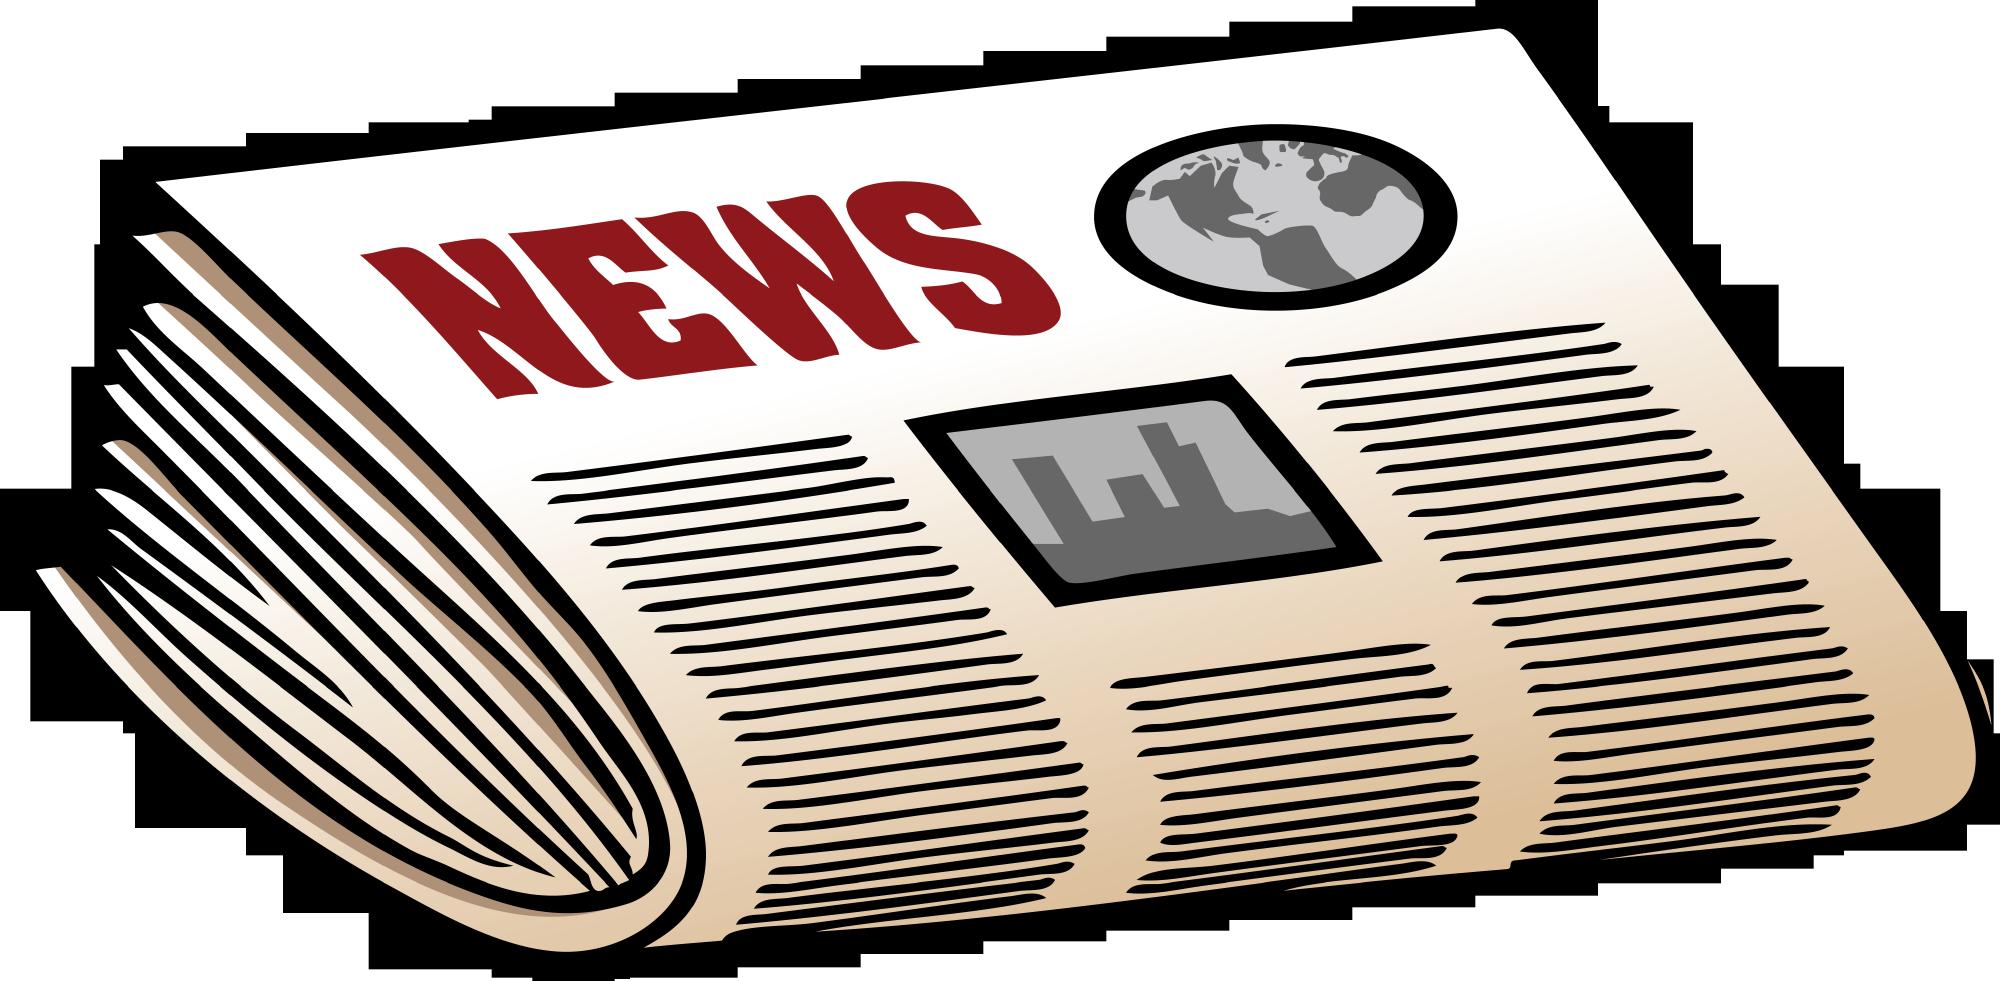 Newspaper Free Download PNG-Newspaper Free Download PNG-2